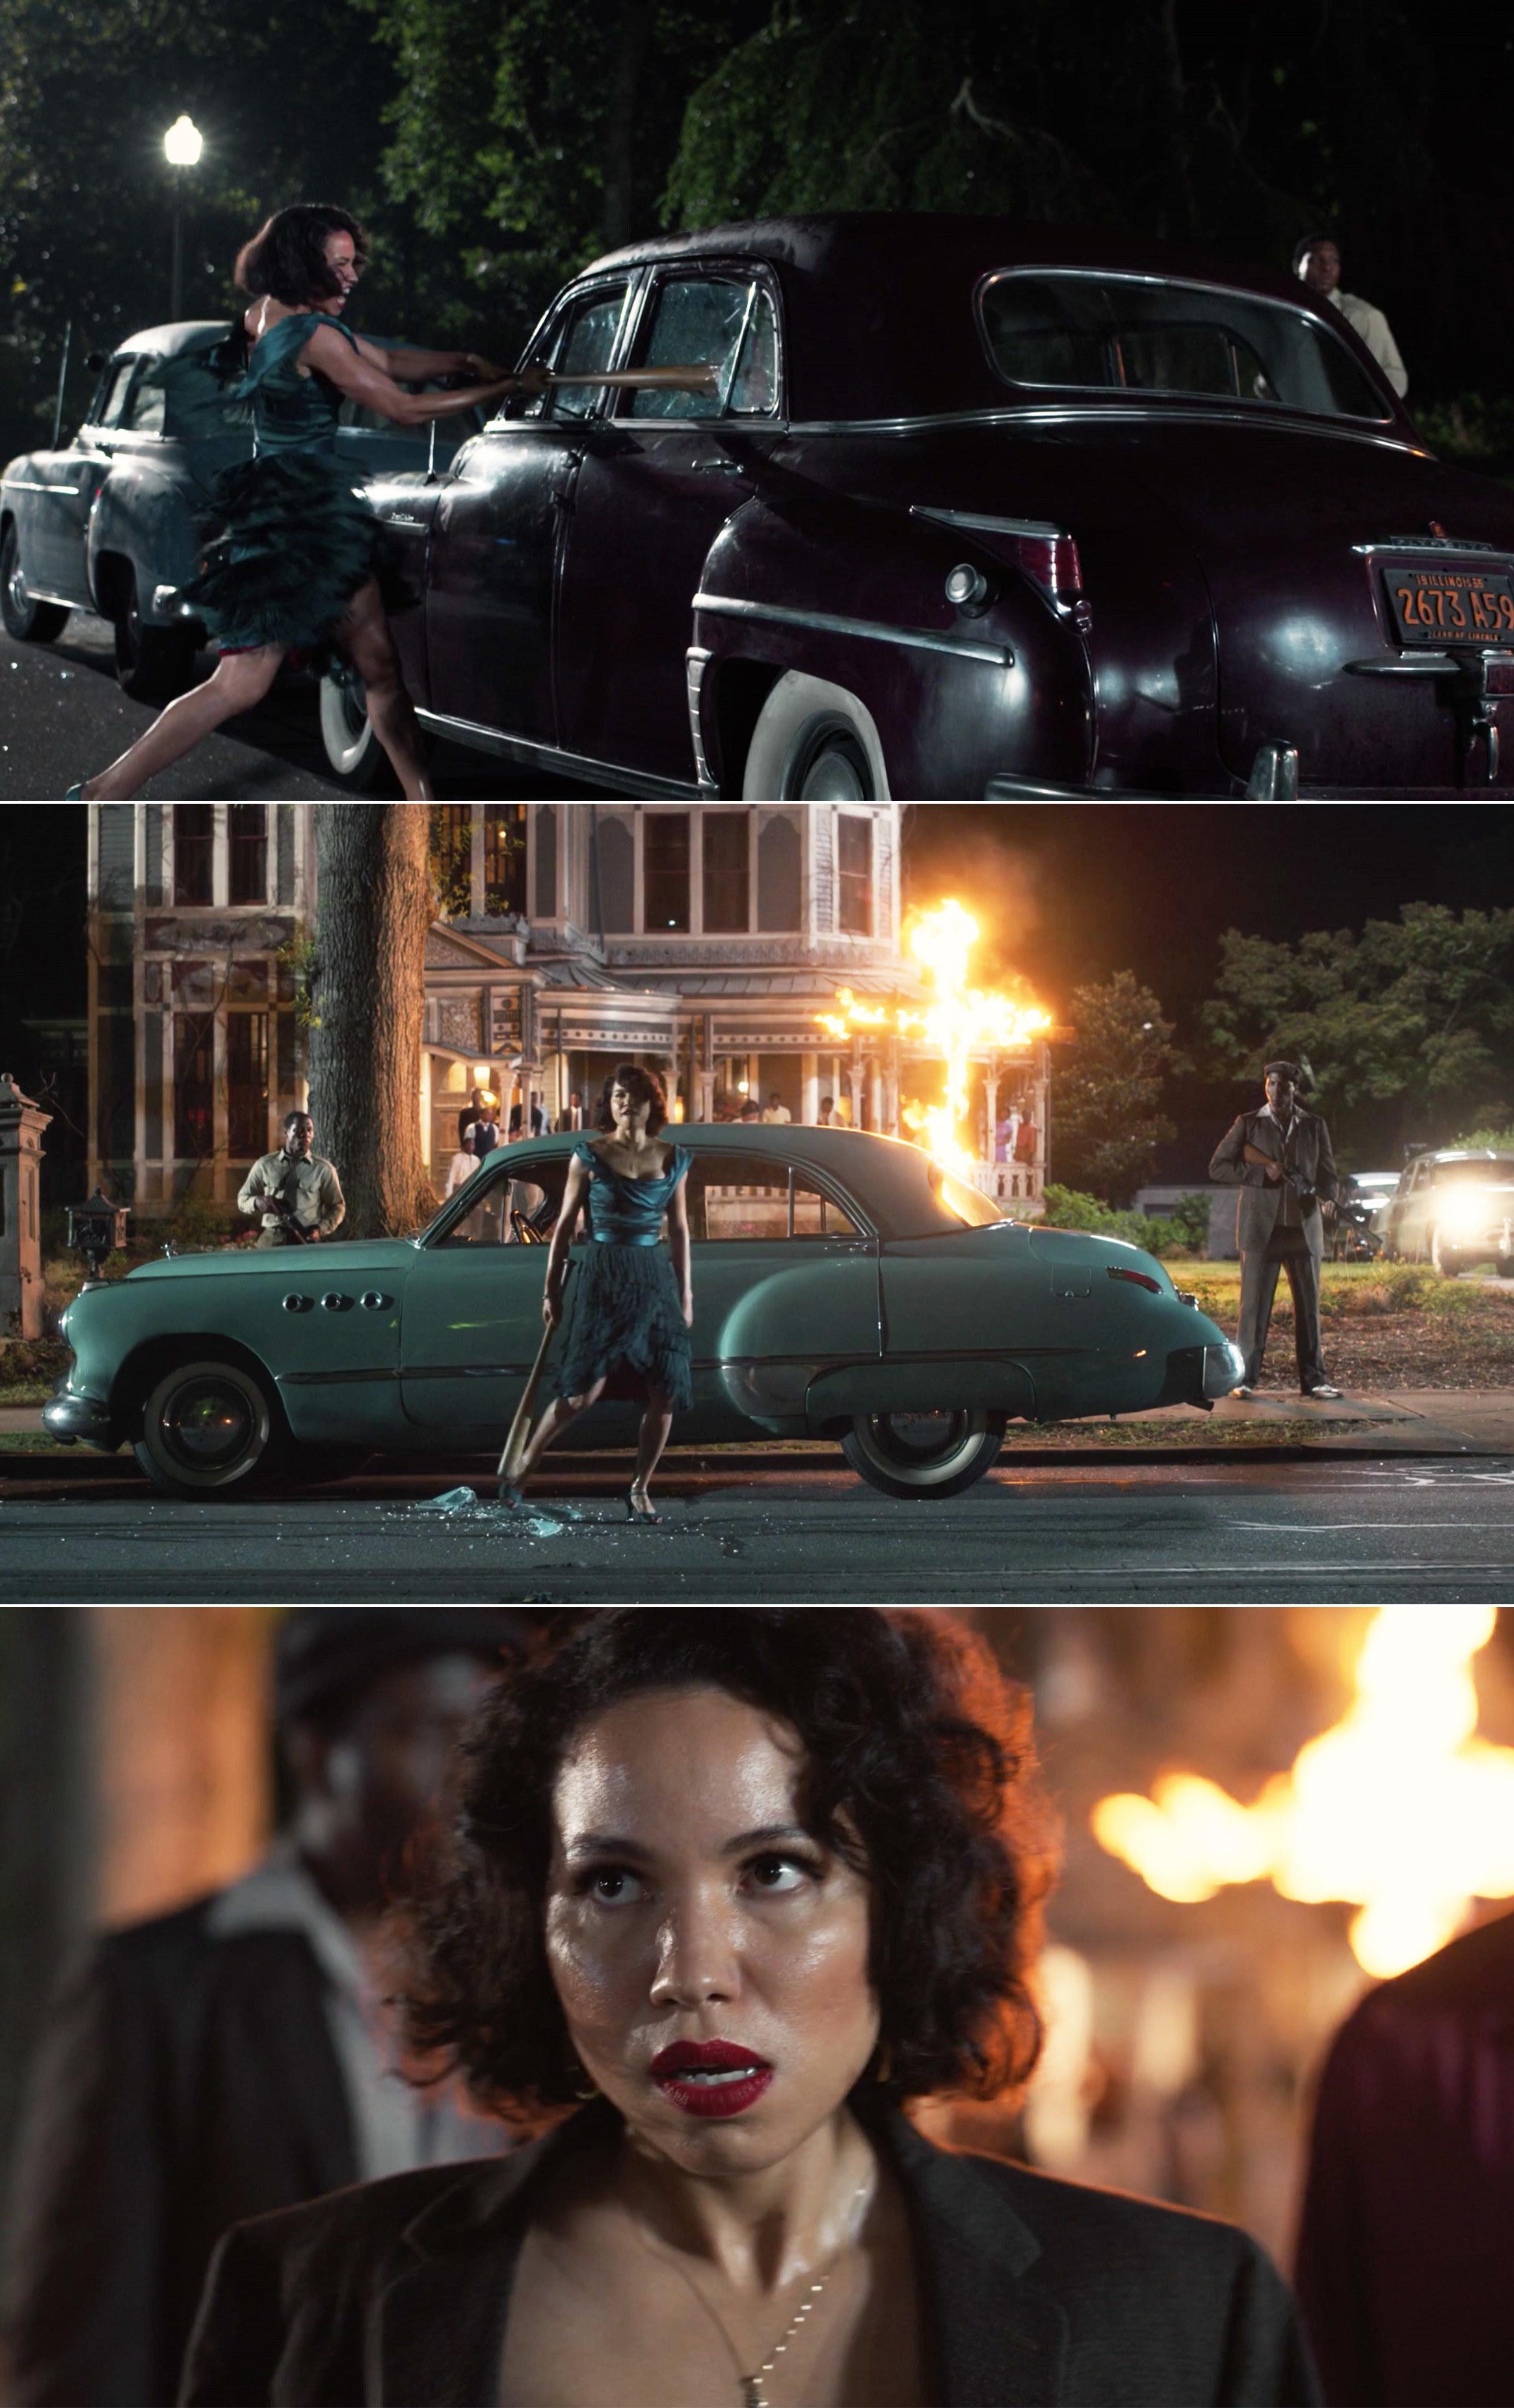 Leti smashing cars with a baseball bat